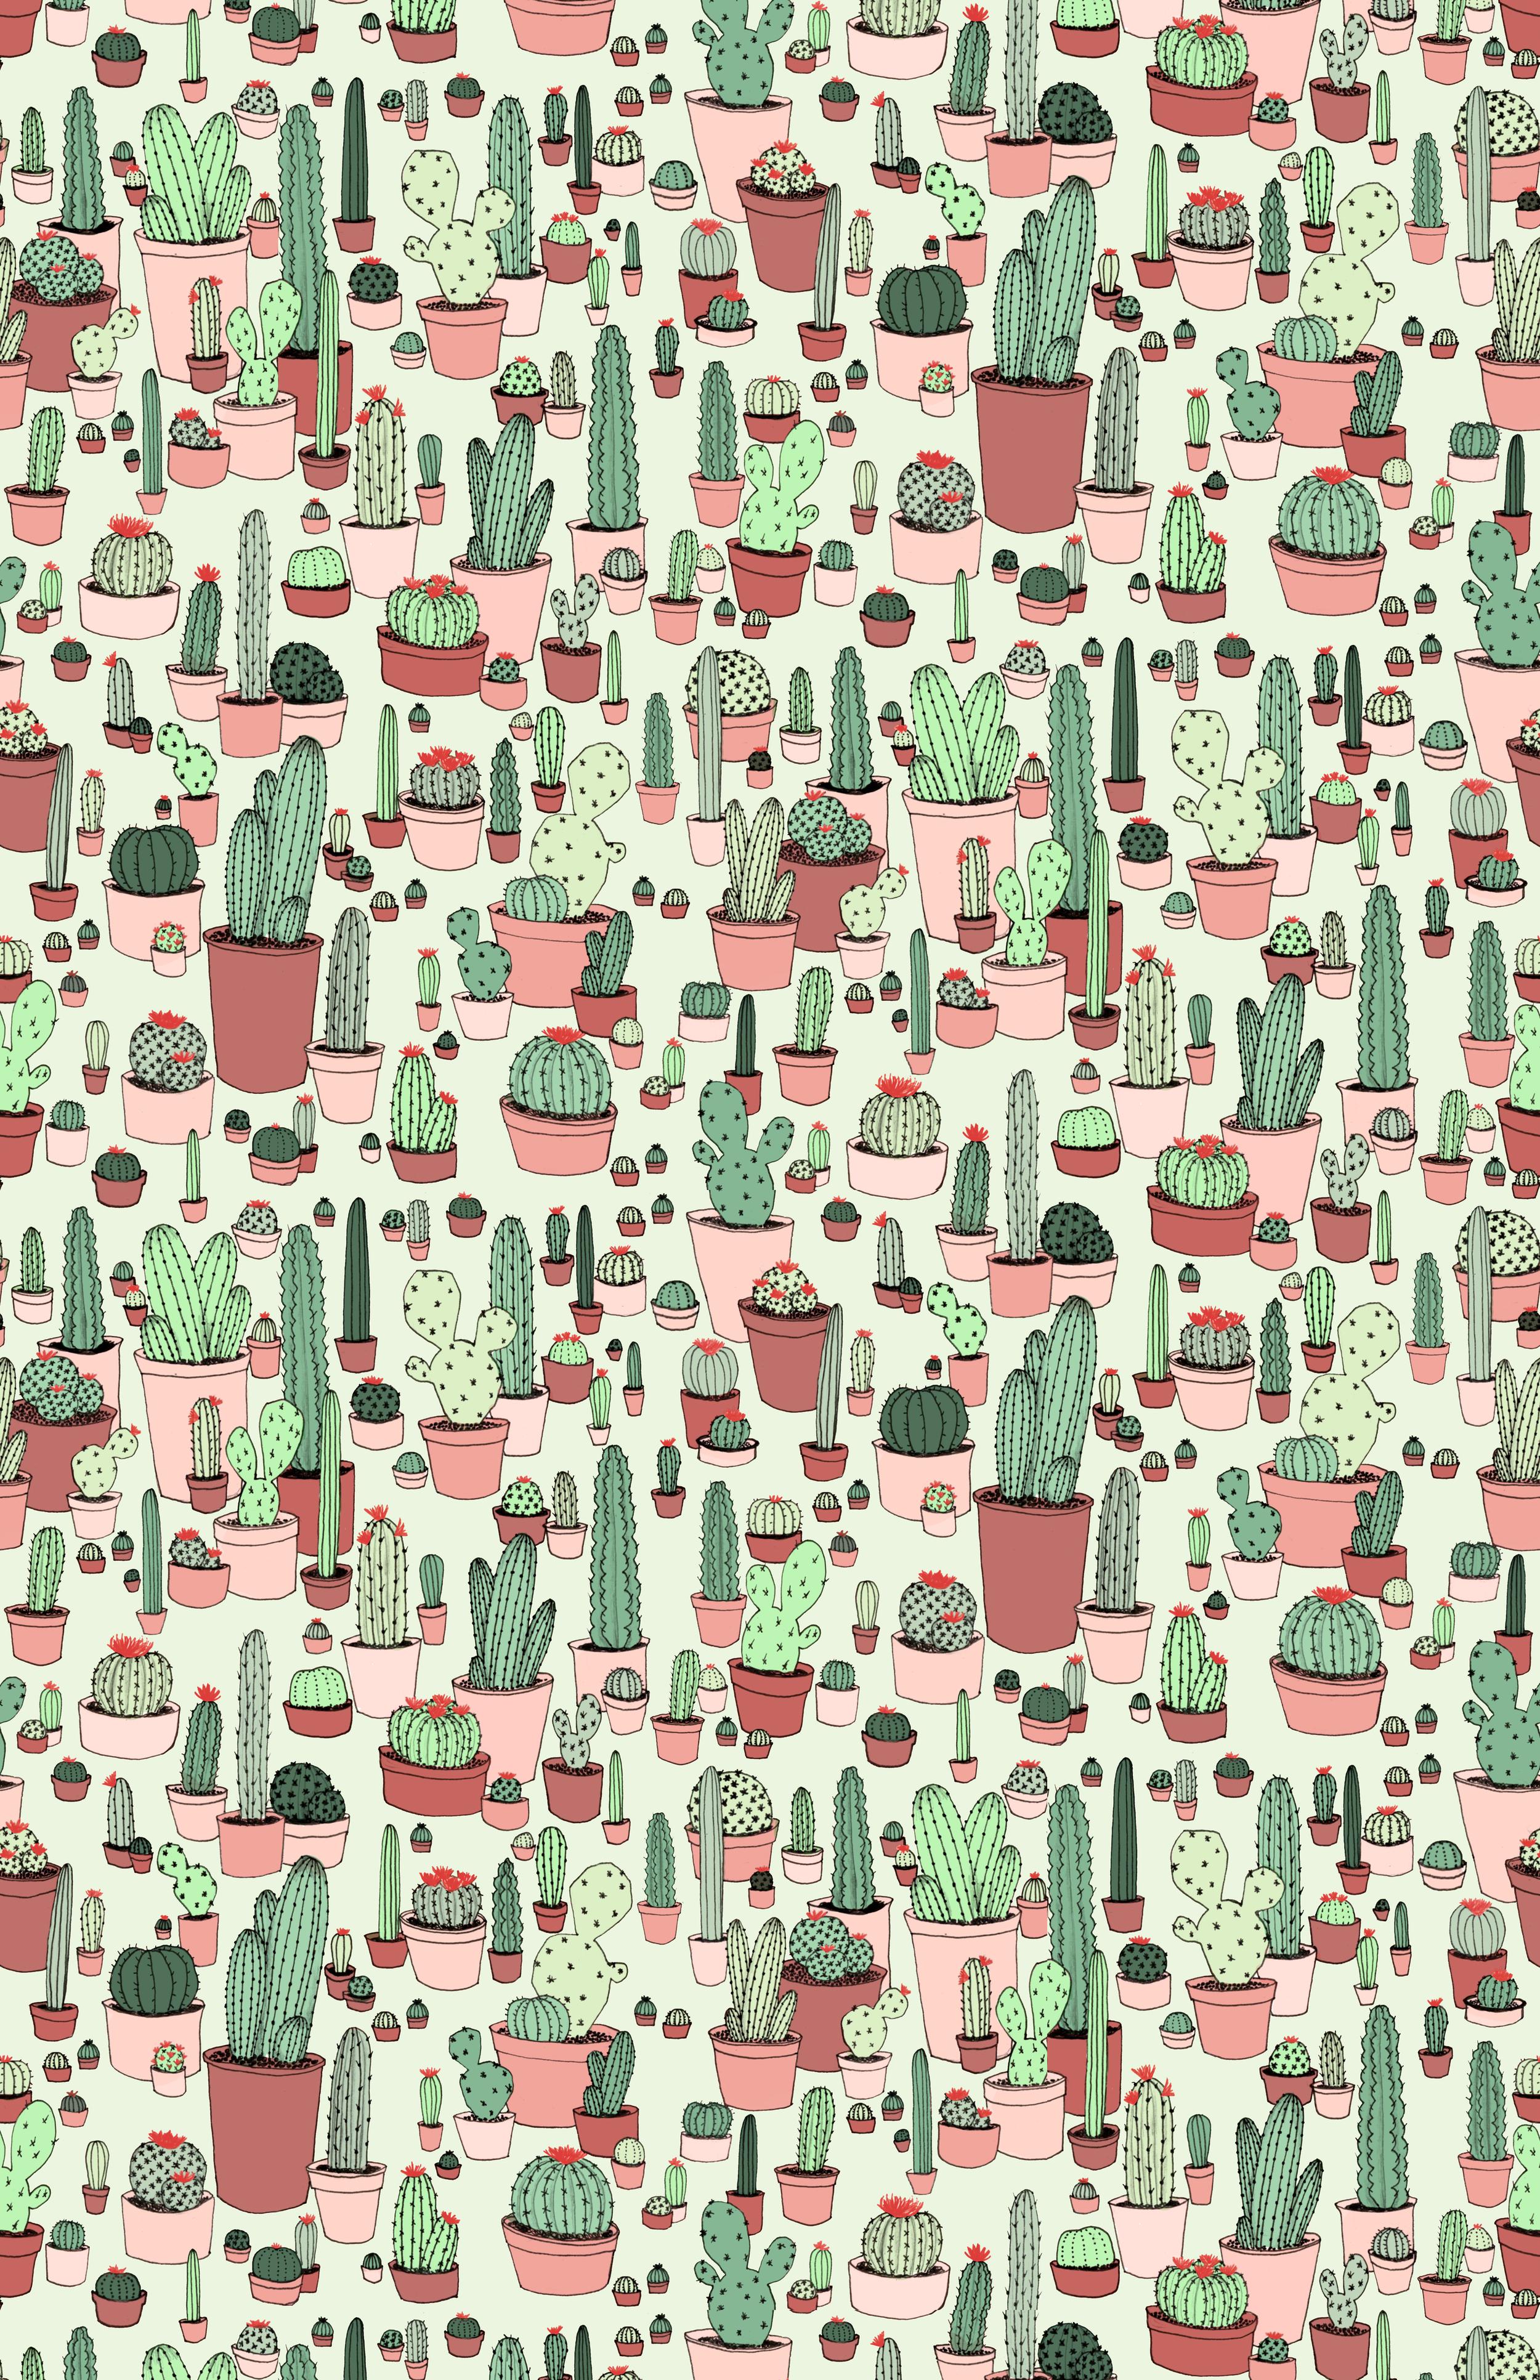 cactustiledsmallest.jpg